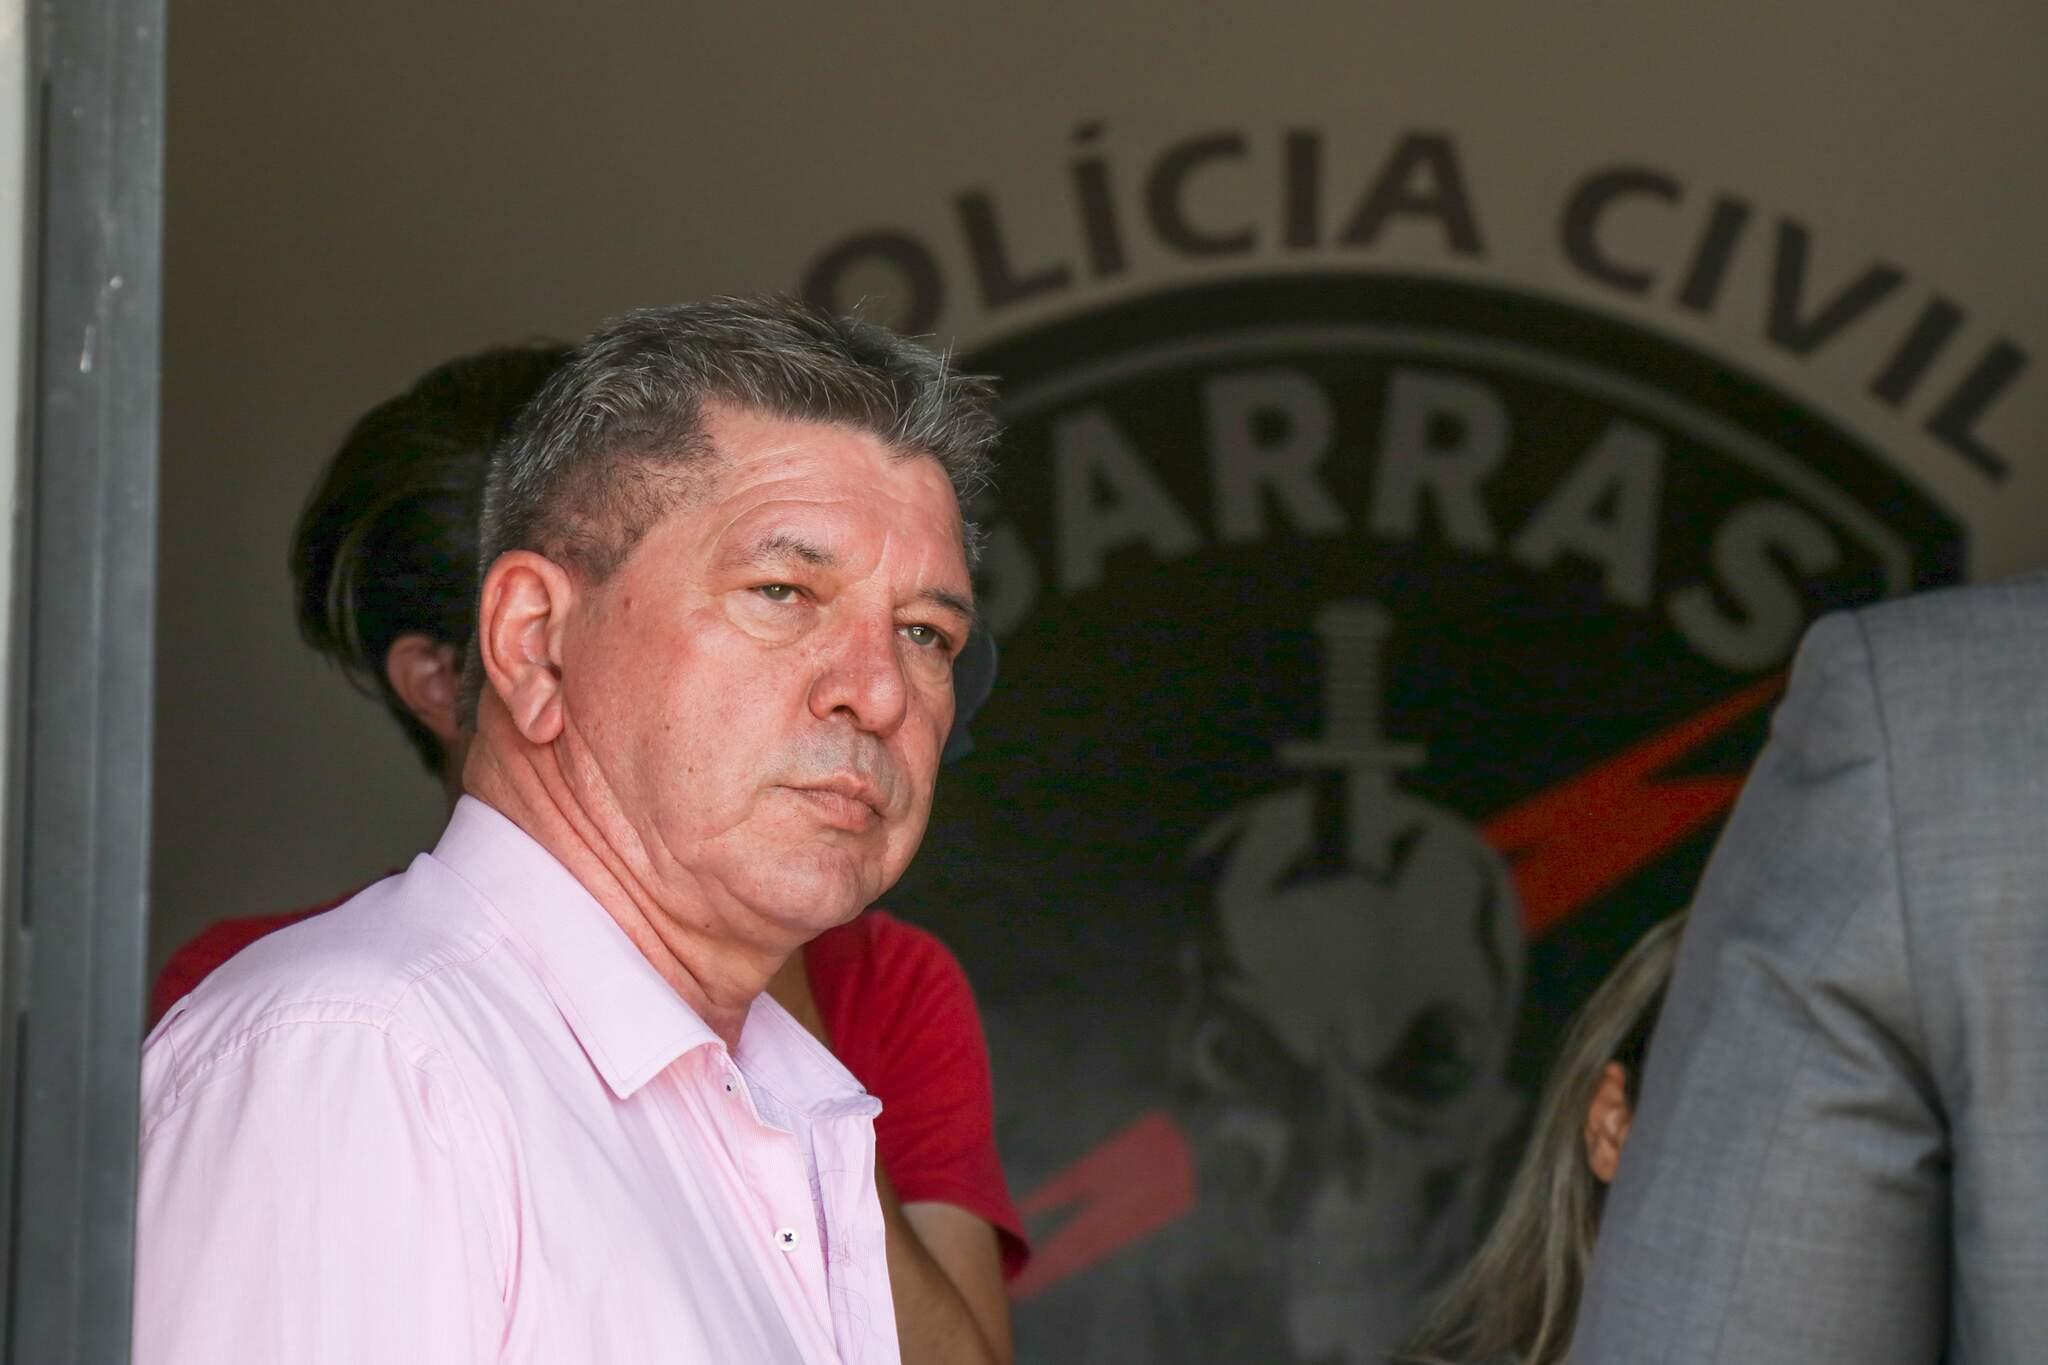 José Carlos de Oliveira antigo dono do imóvel no Jardim Monte Líbano. (Foto: Henrique Kawaminami)